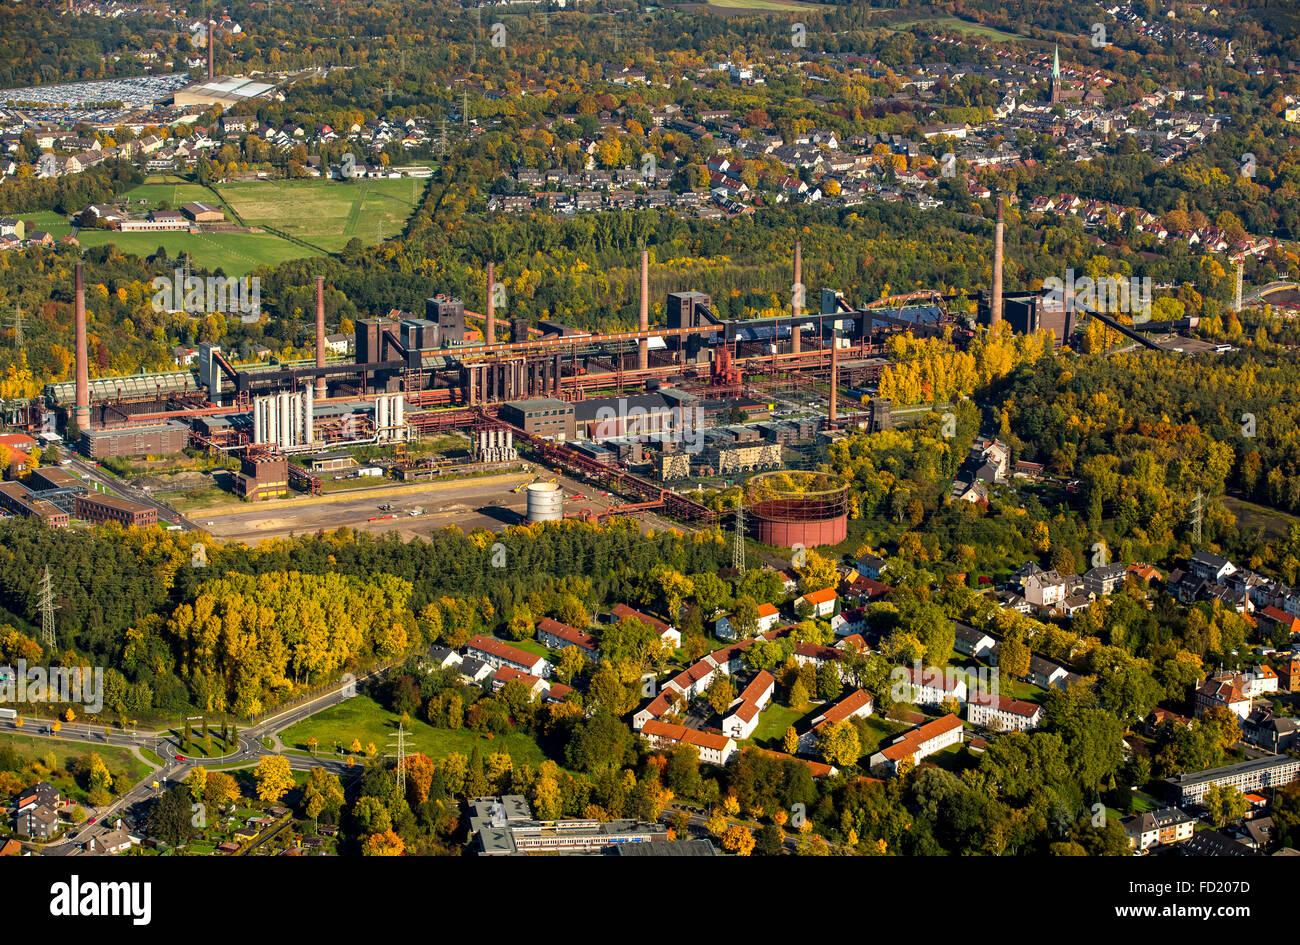 Zollverein coking plant, autumn, Zollverein Coal Mine Industrial Complex, UNESCO World Heritage Site, Essen, Ruhr - Stock Image